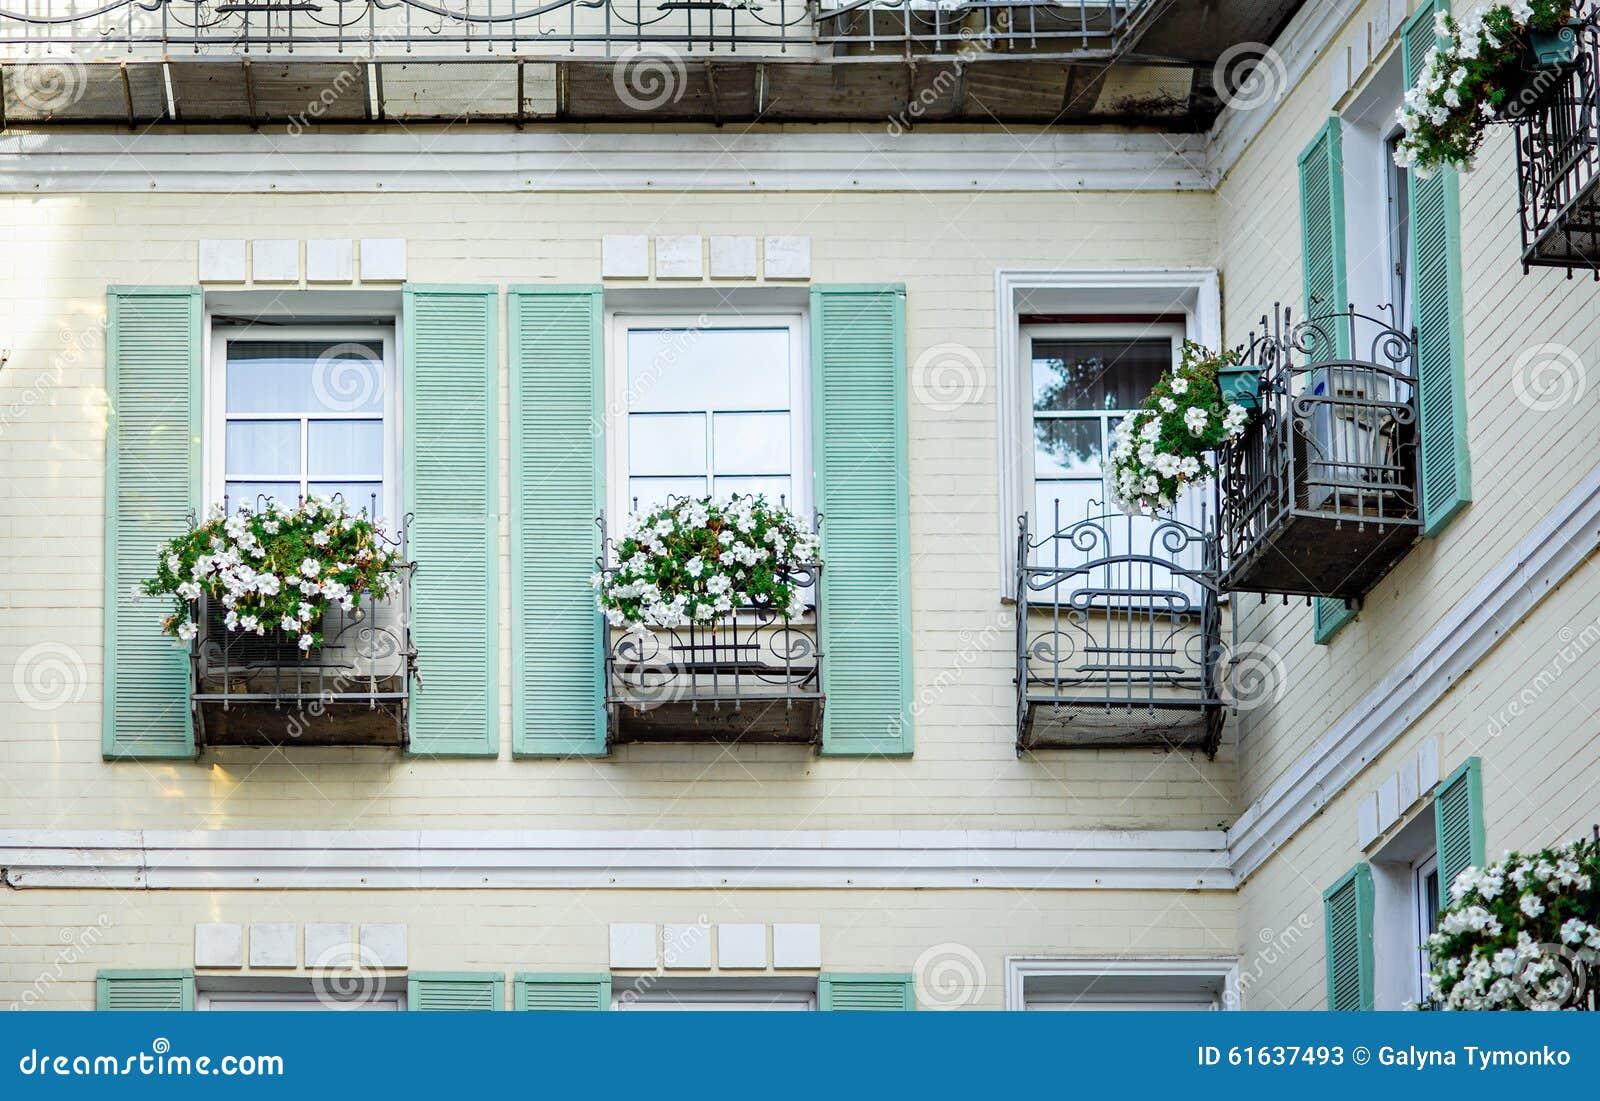 E stock foto afbeelding 61637493 - Tuin decoratie buitenkant ...